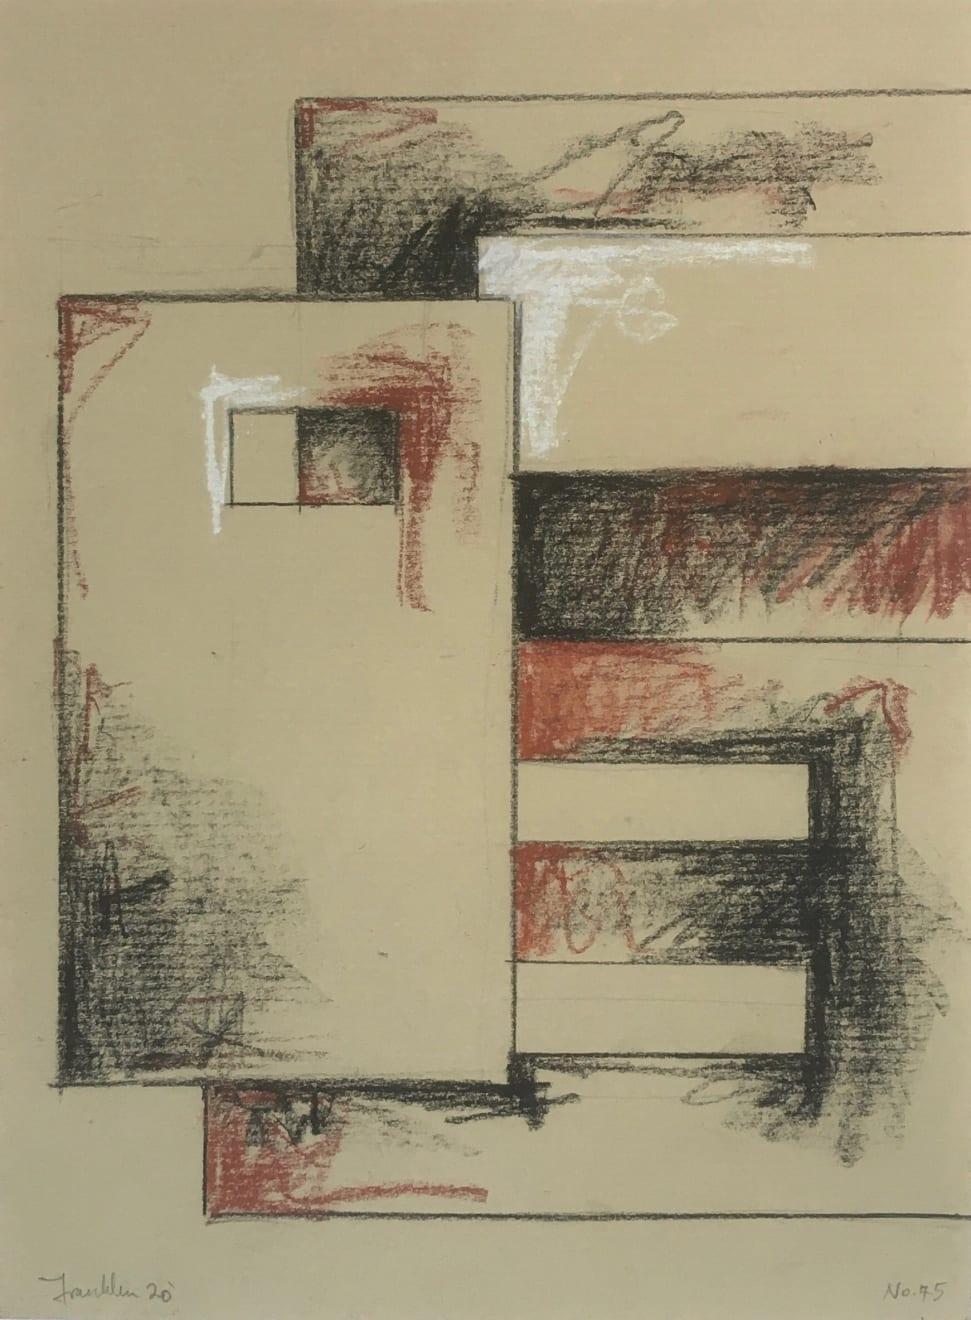 Malcolm Franklin, Tenement Sketch no.45, 2020